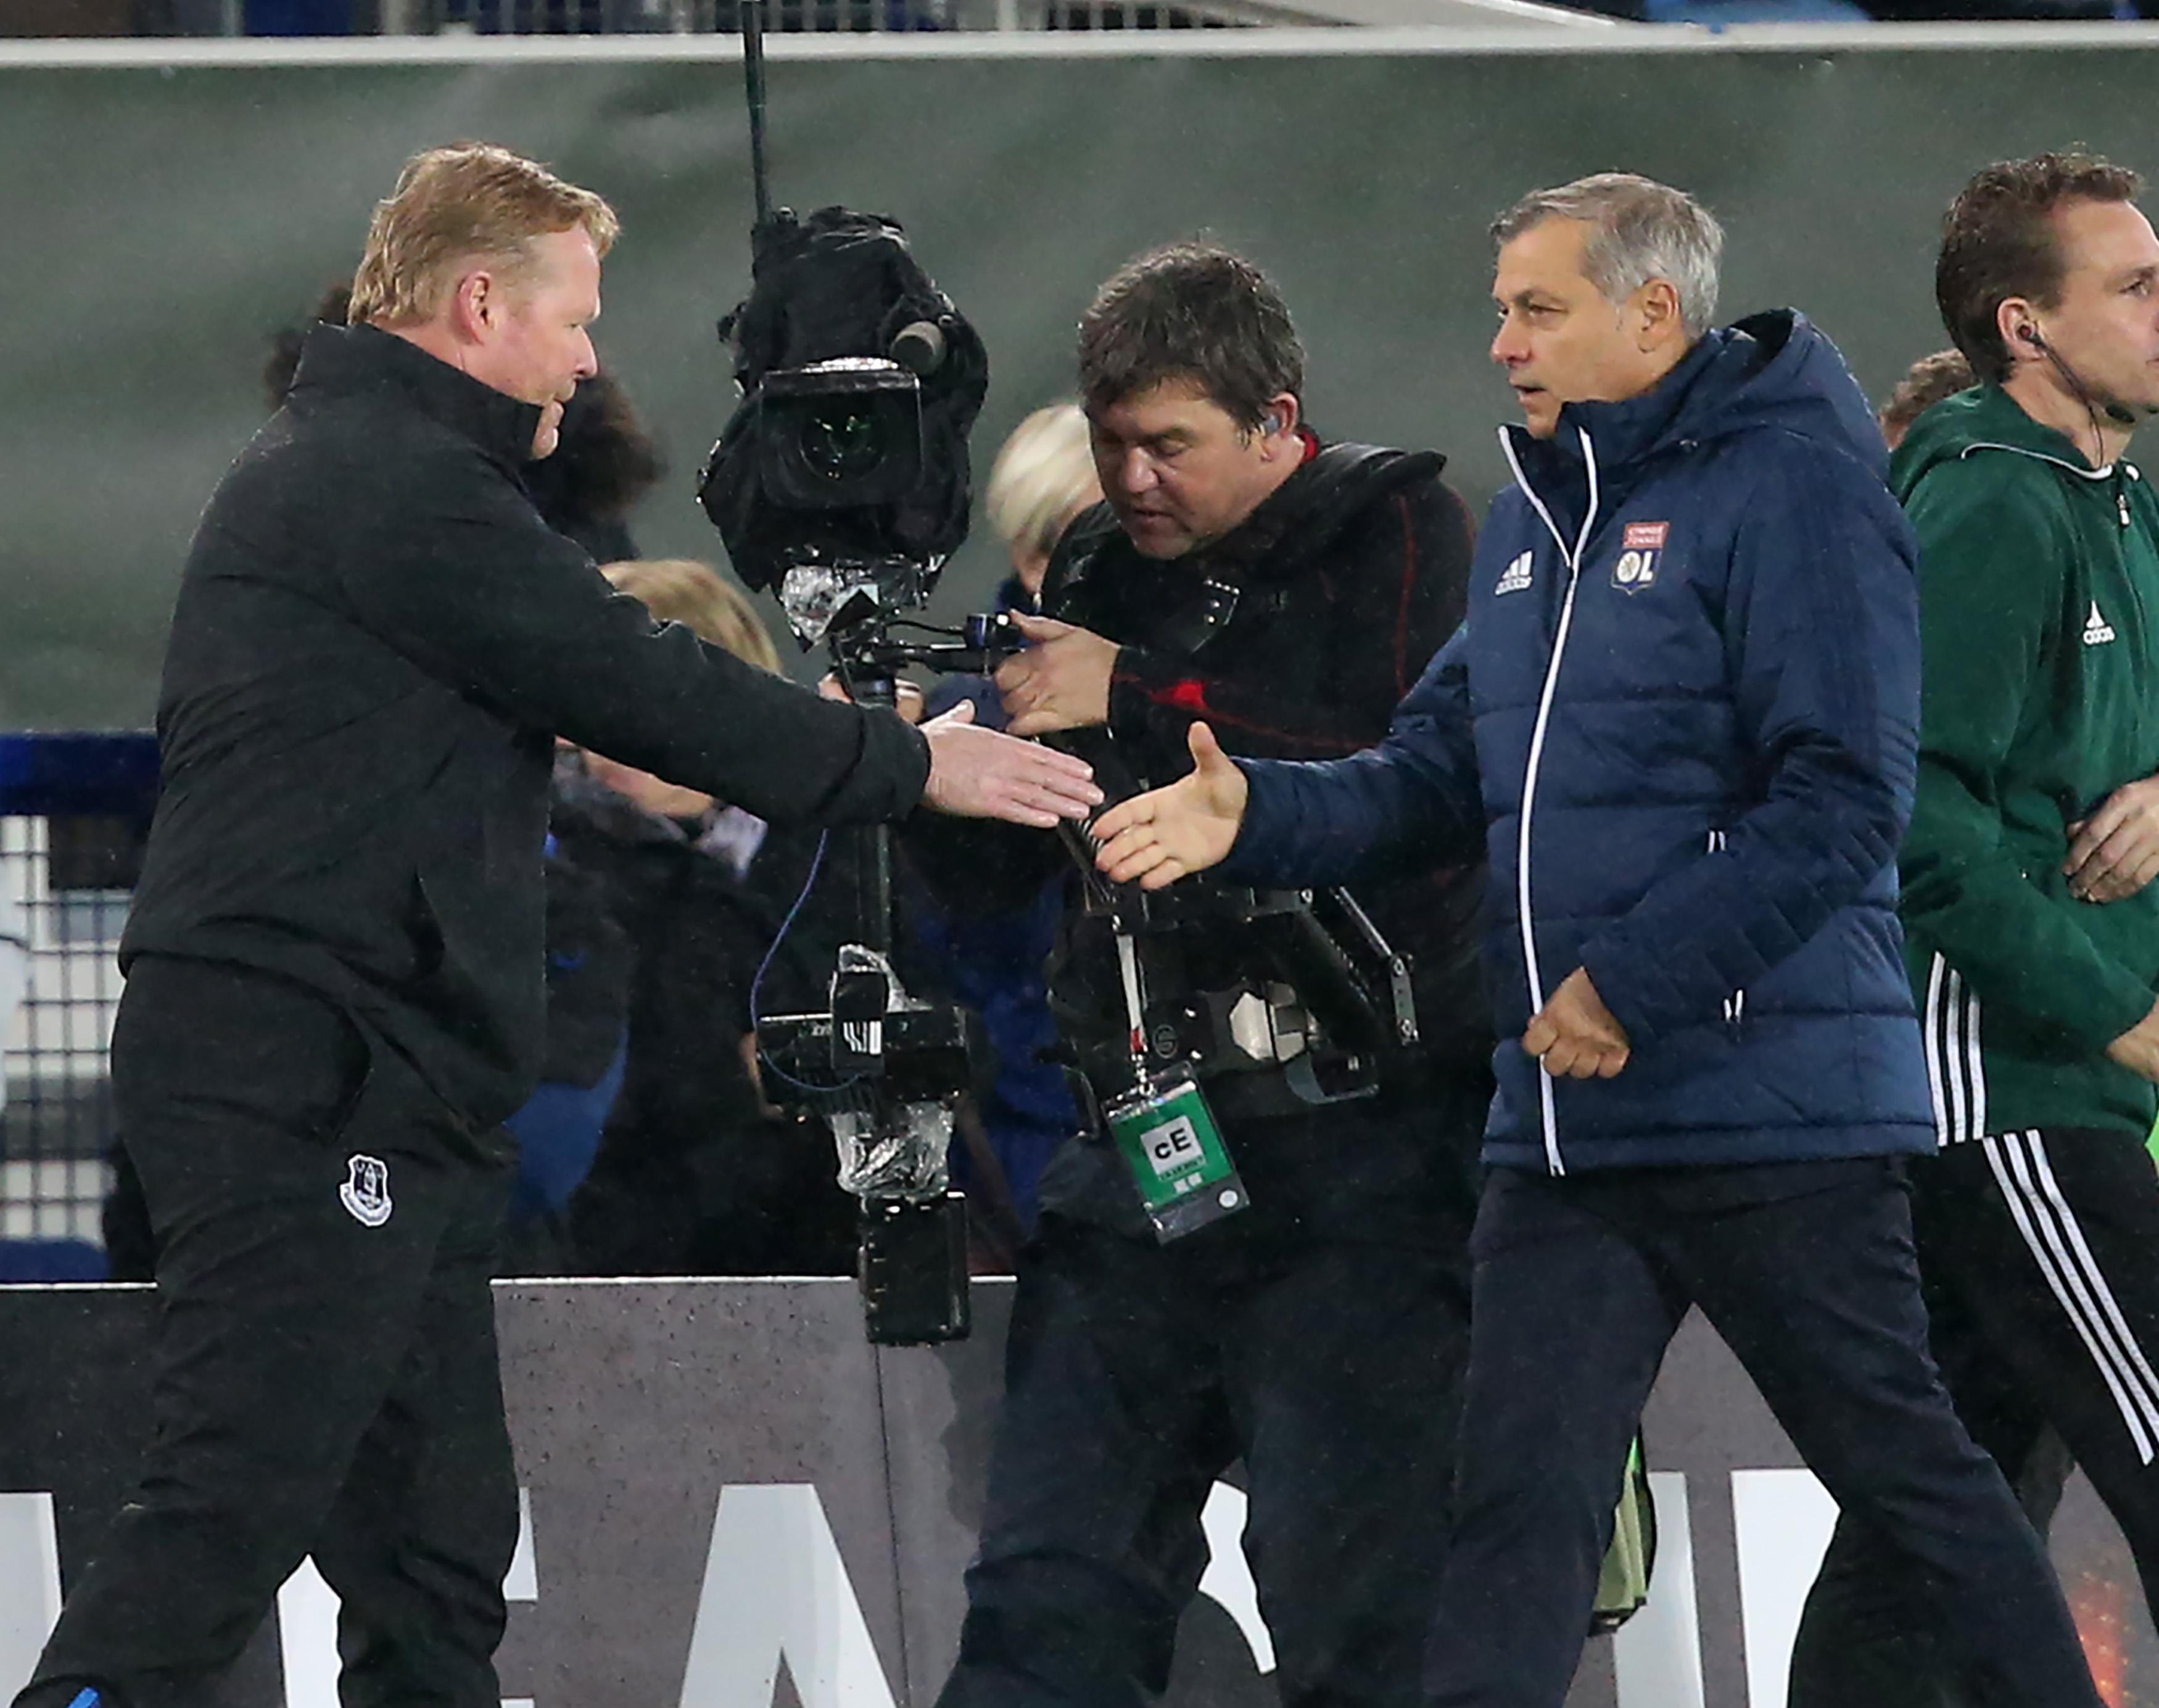 Football - Ligue Europa - Genesio: «Cette bagarre nous a fait sortir du match»